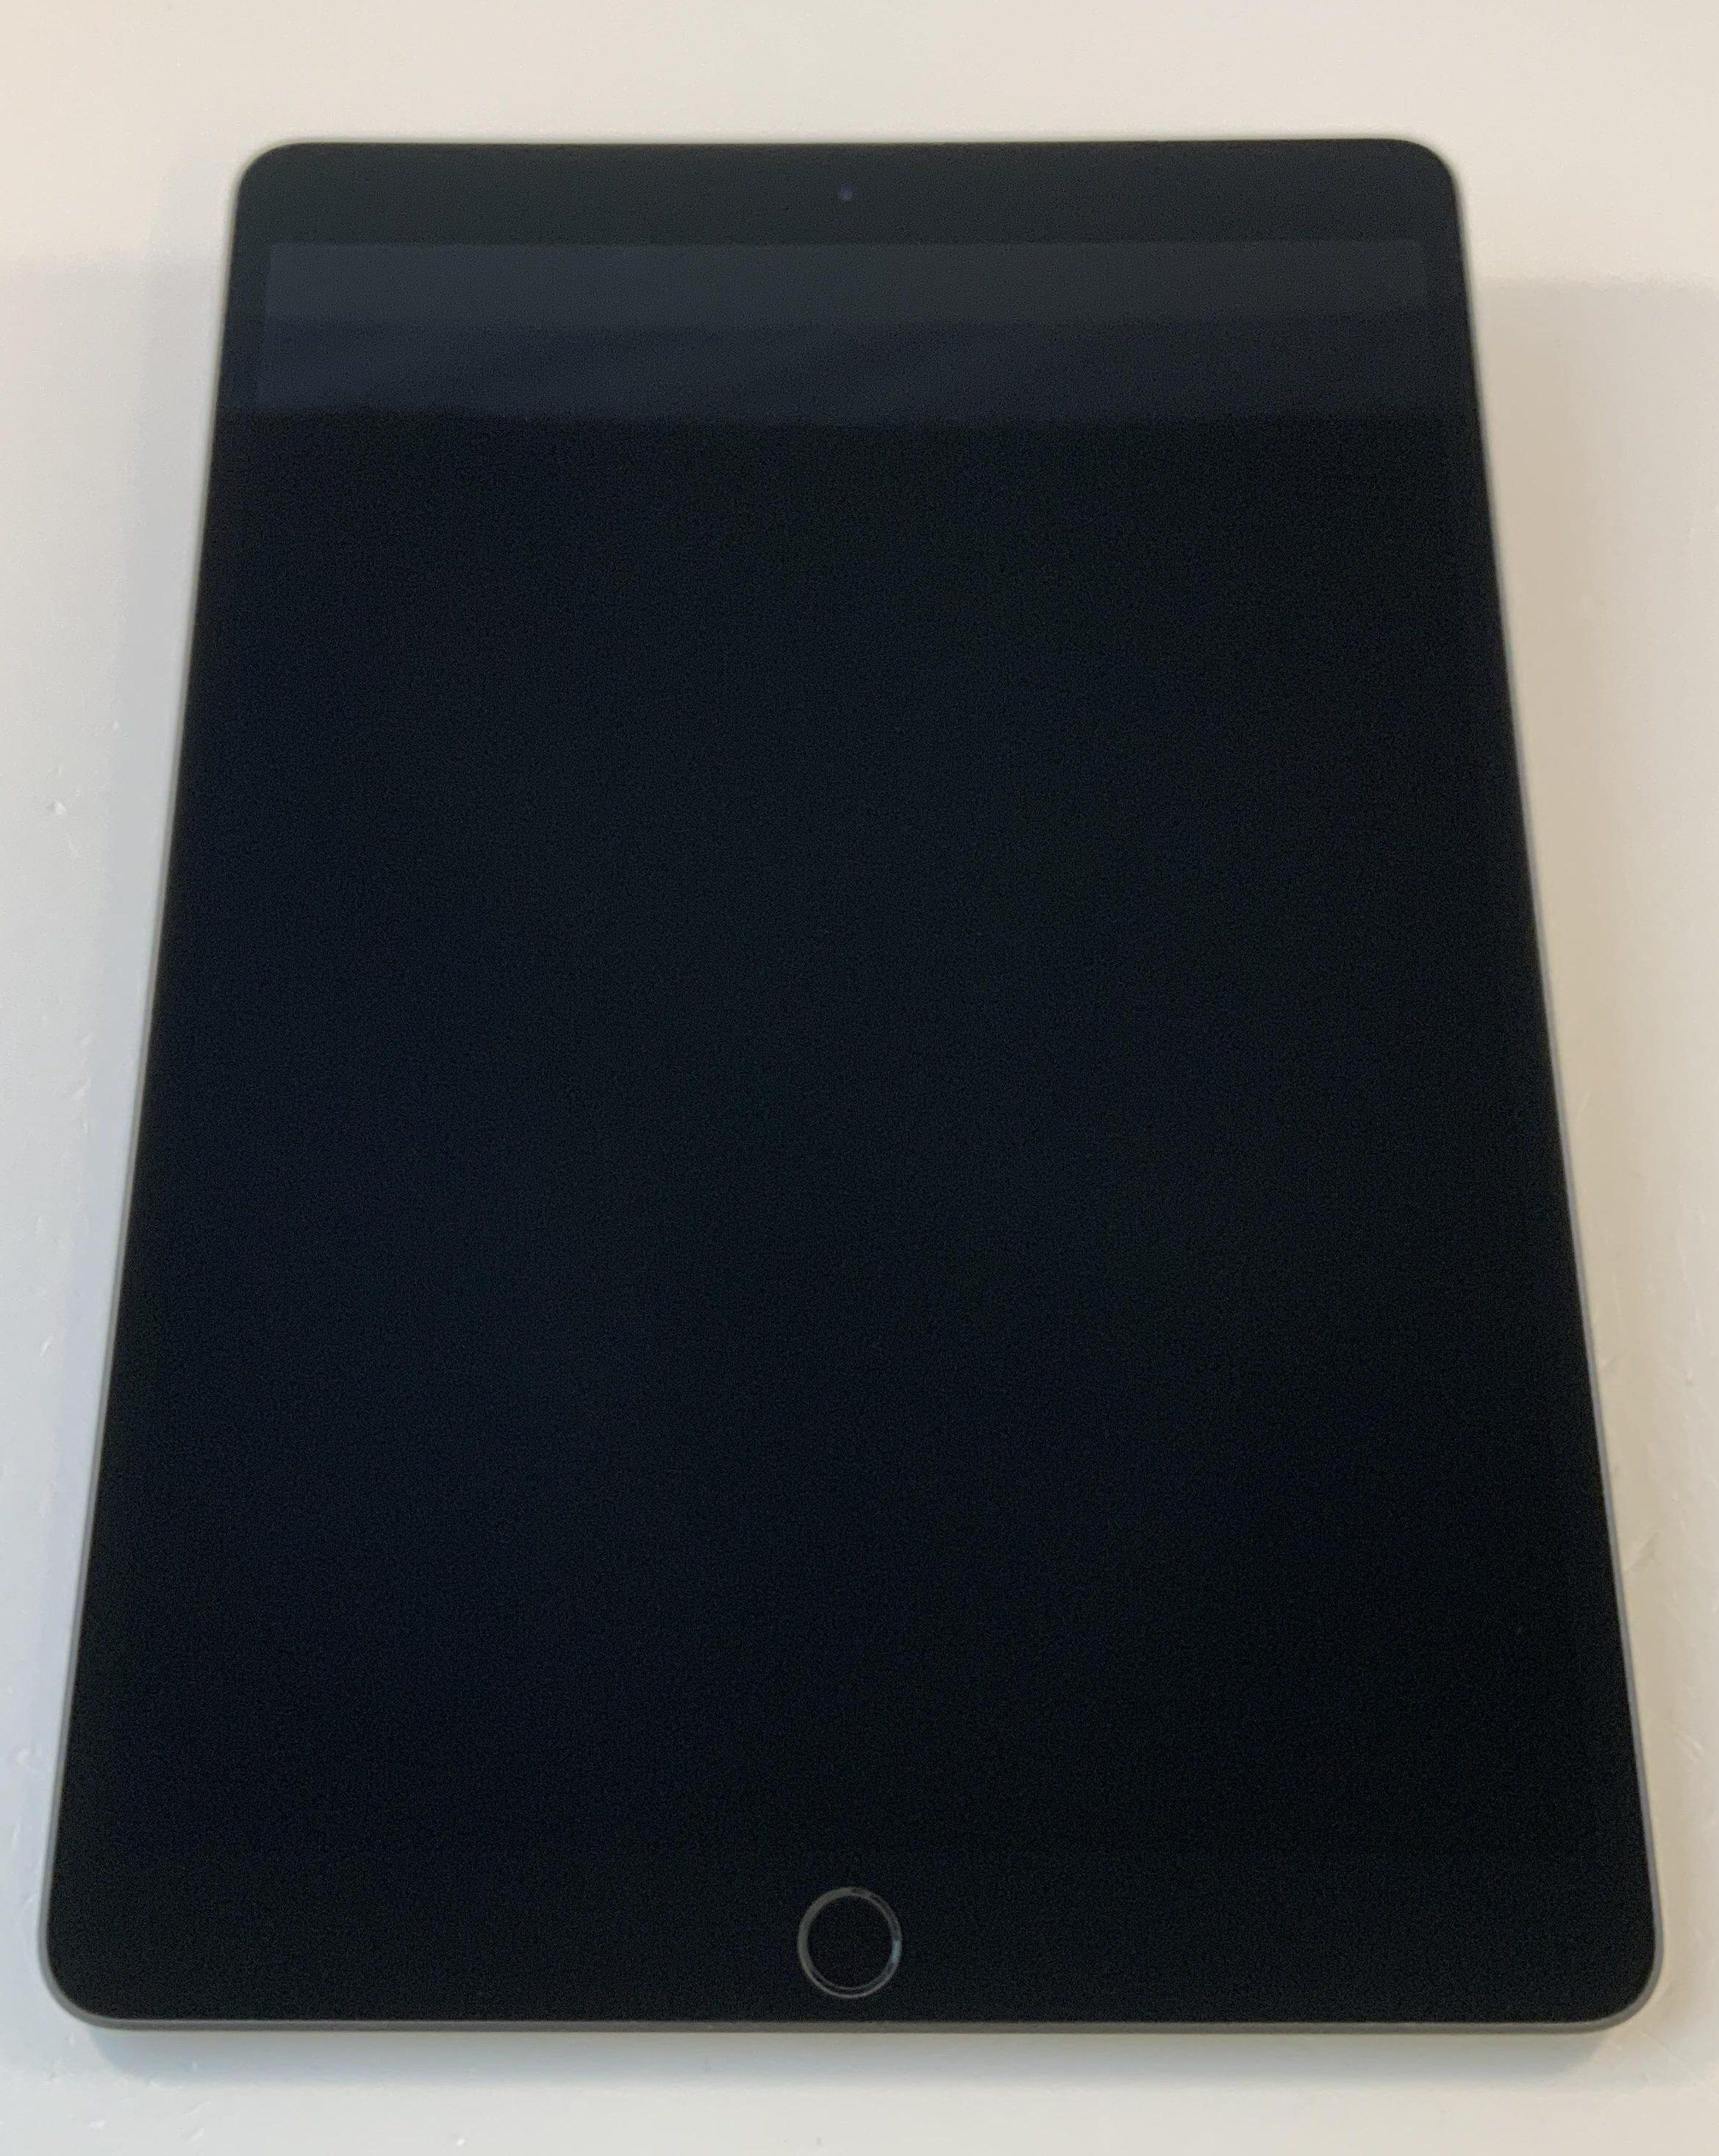 iPad Air 3 Wi-Fi + Cellular 256GB, 256GB, Space Gray, image 1